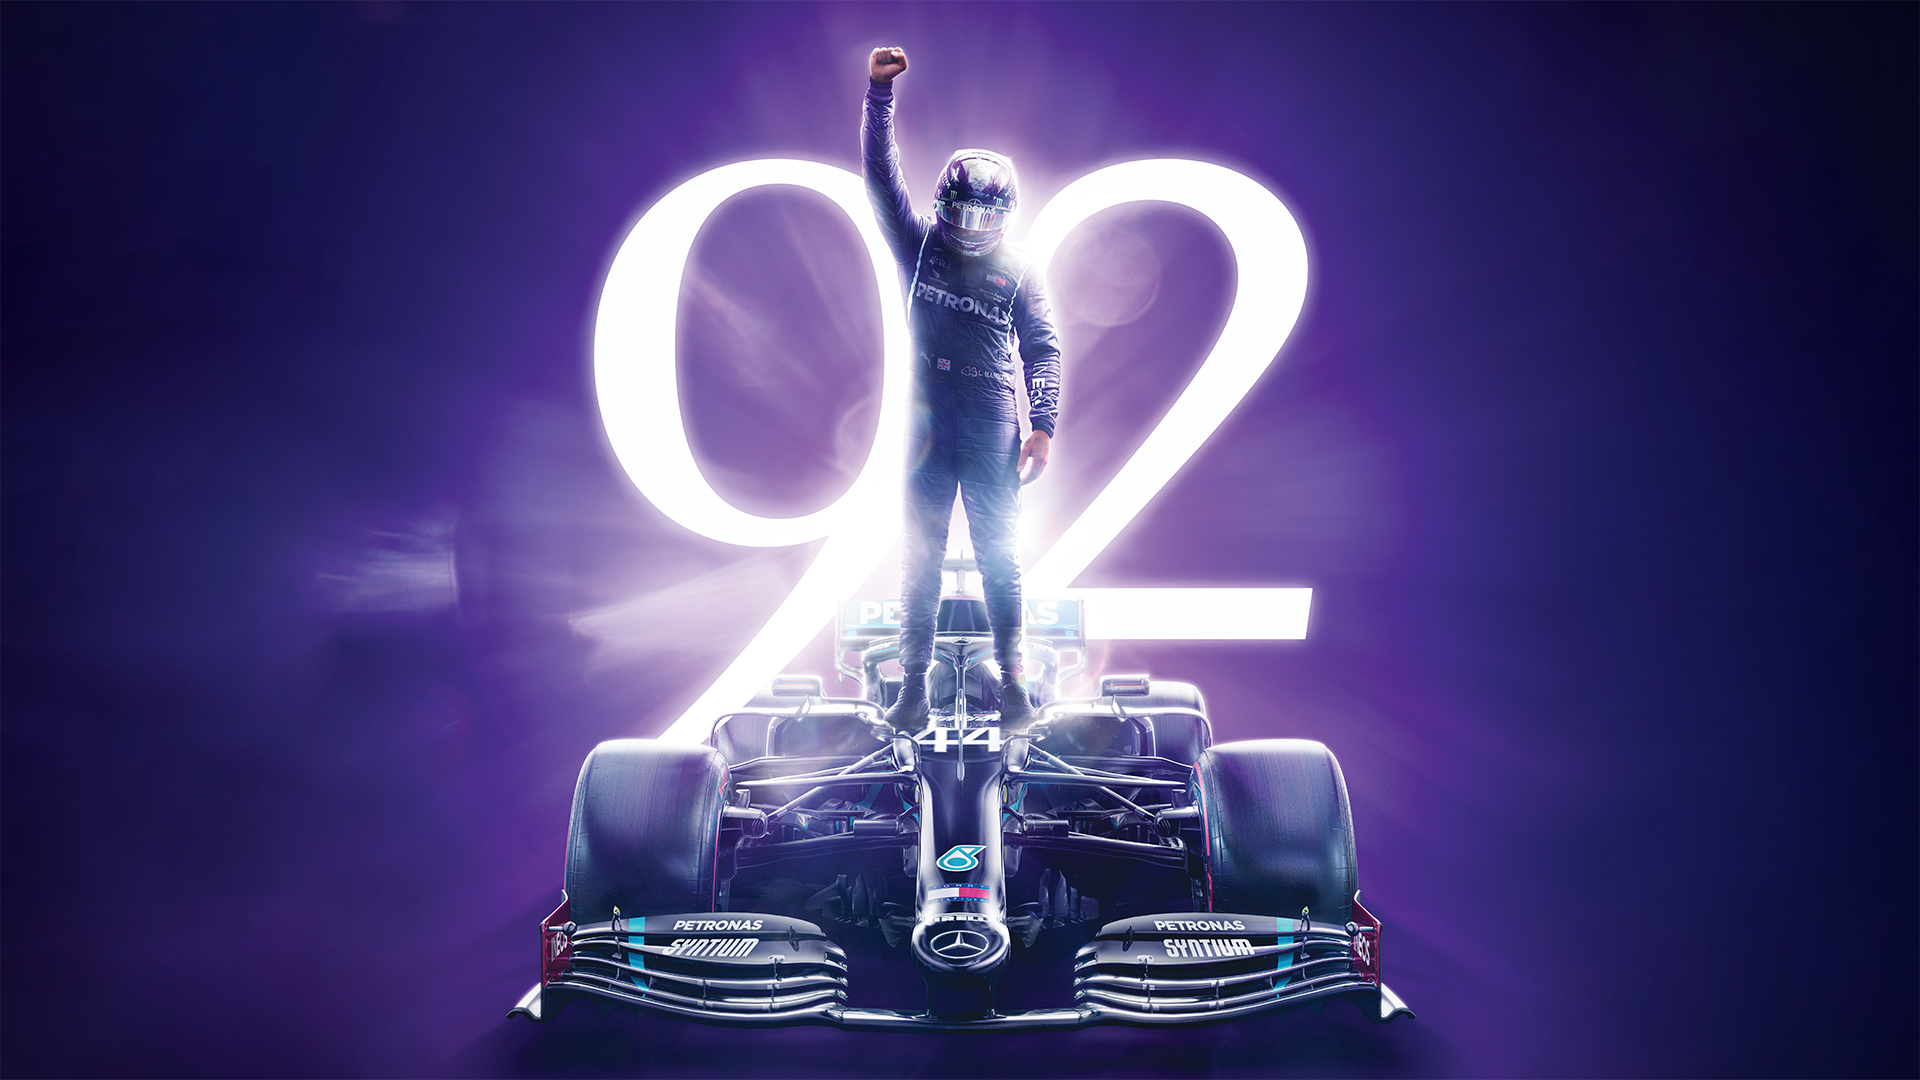 Hamilton célèbre sa 92ème victoire